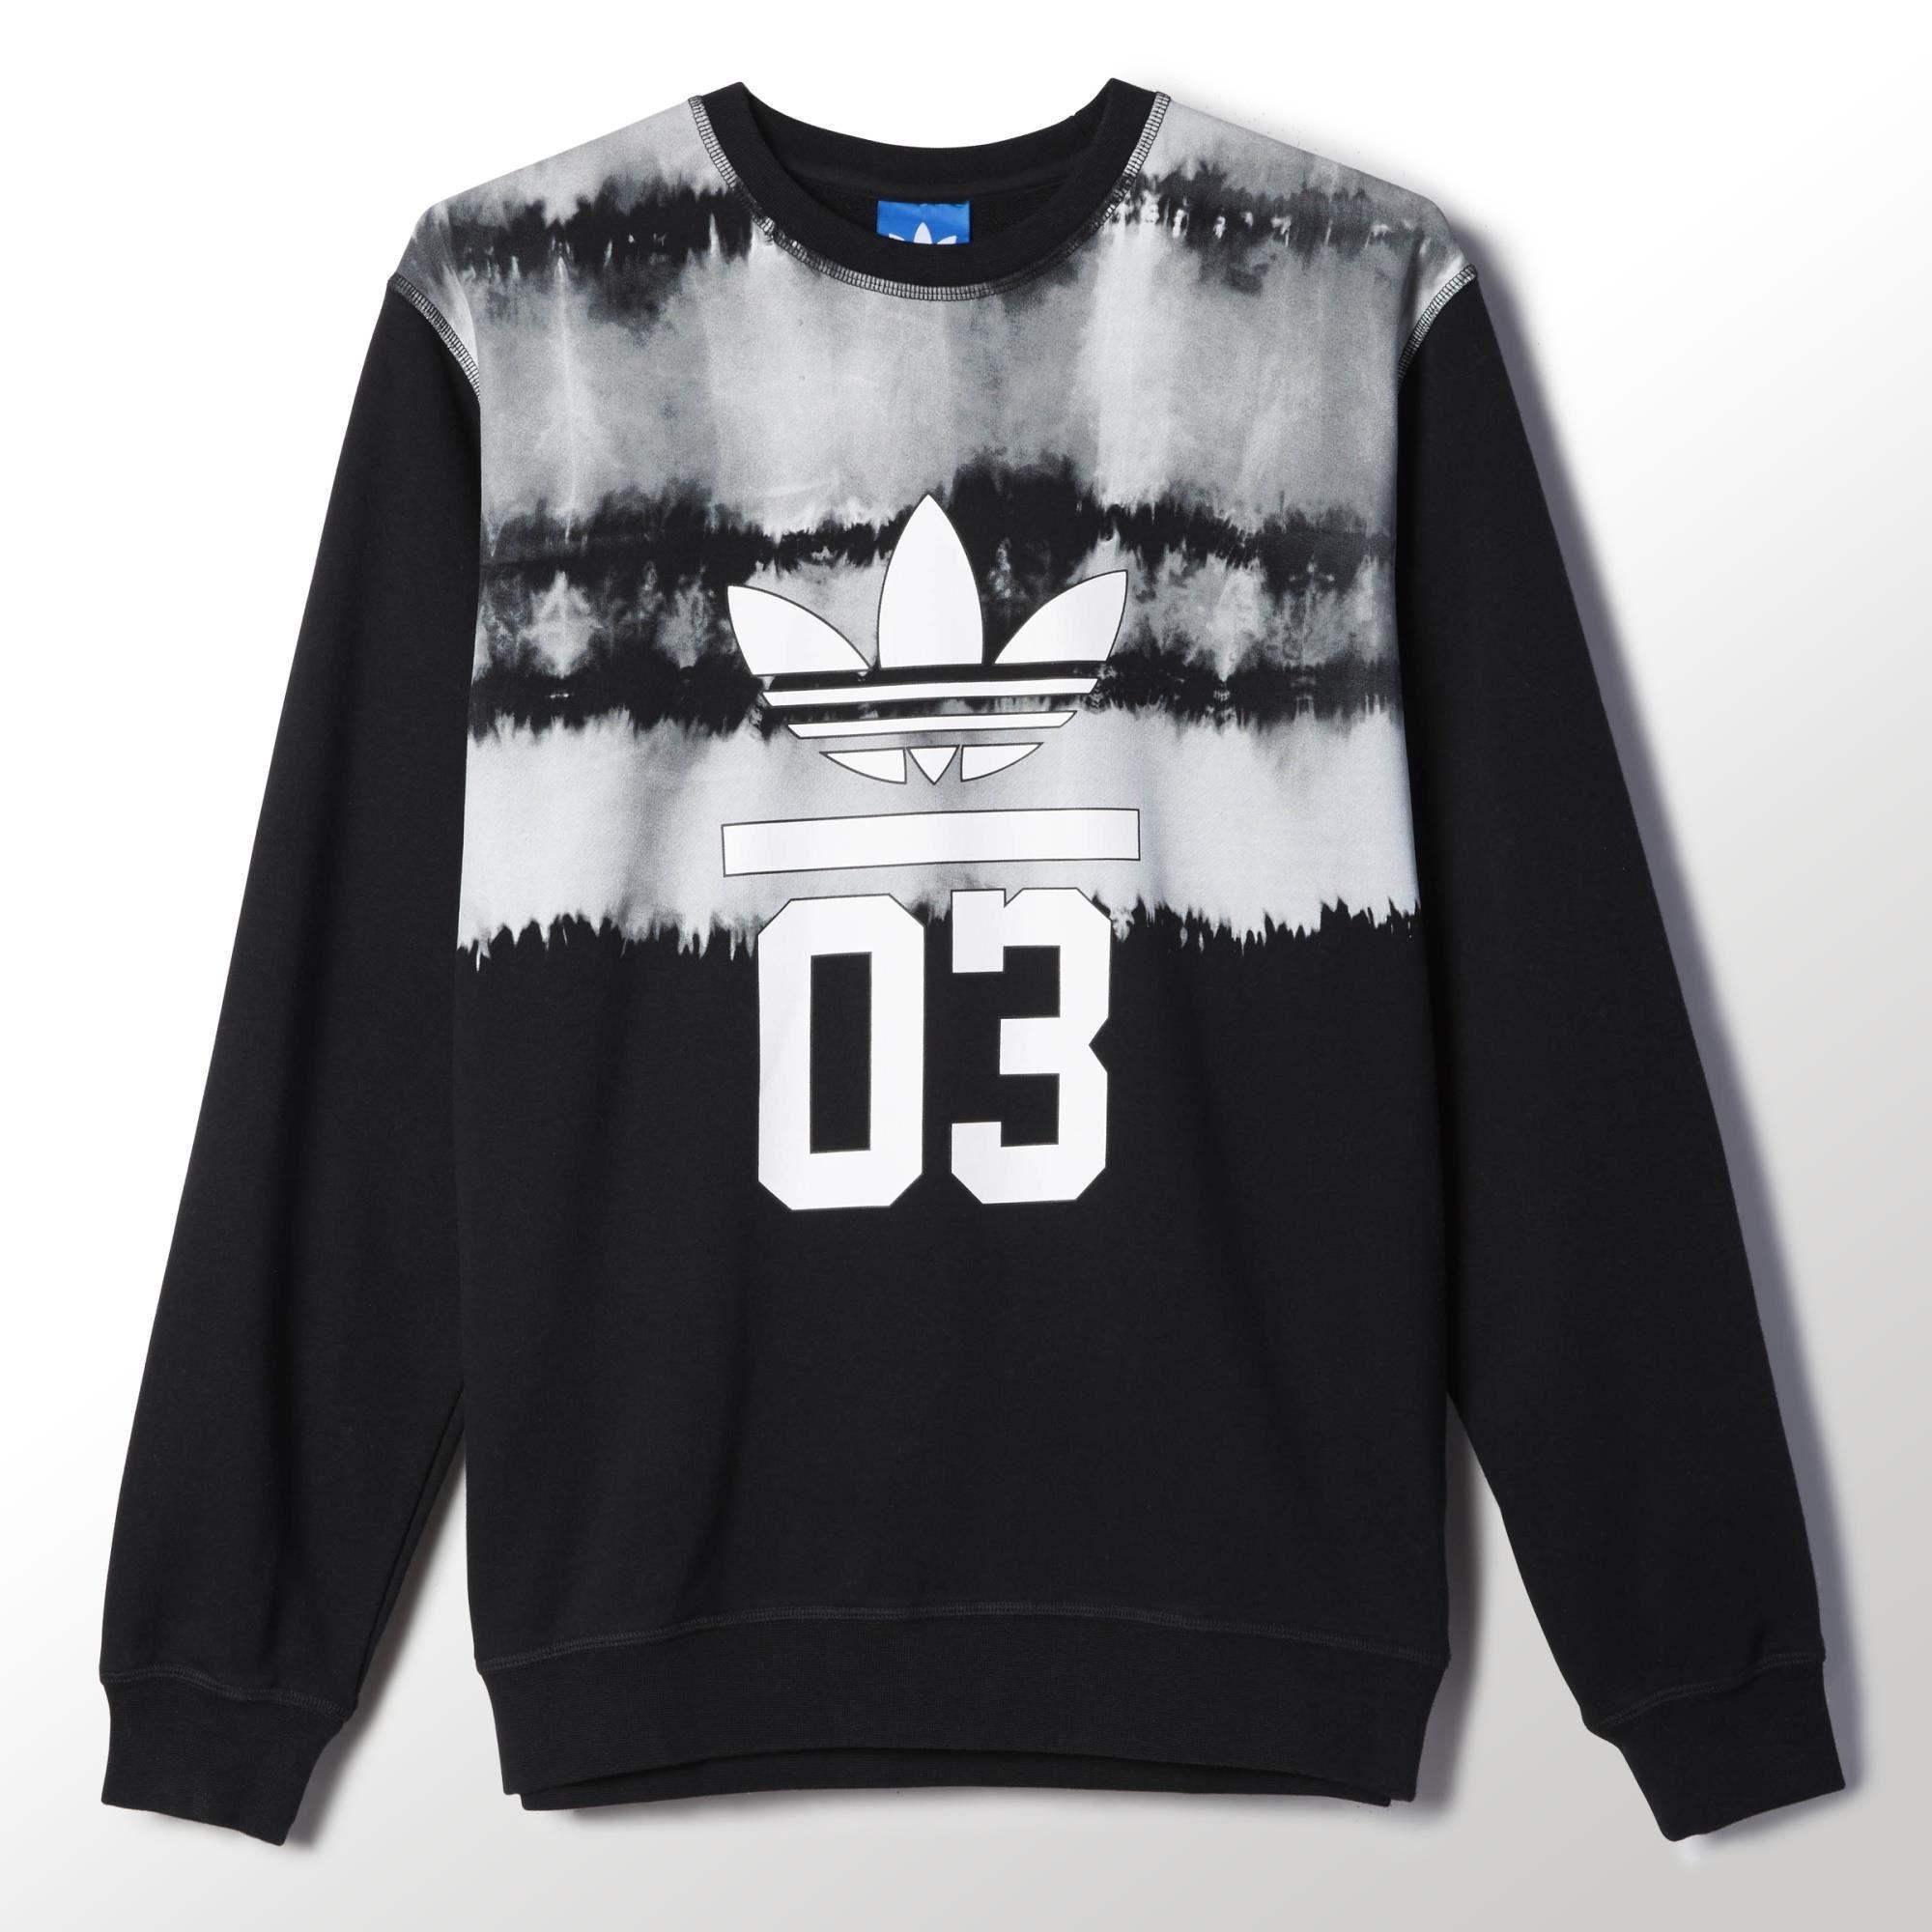 Adidas 3foil Printed Crew Sweatshirt Adidas Australia Sweatshirts Crew Sweatshirts Fashion [ 2000 x 2000 Pixel ]